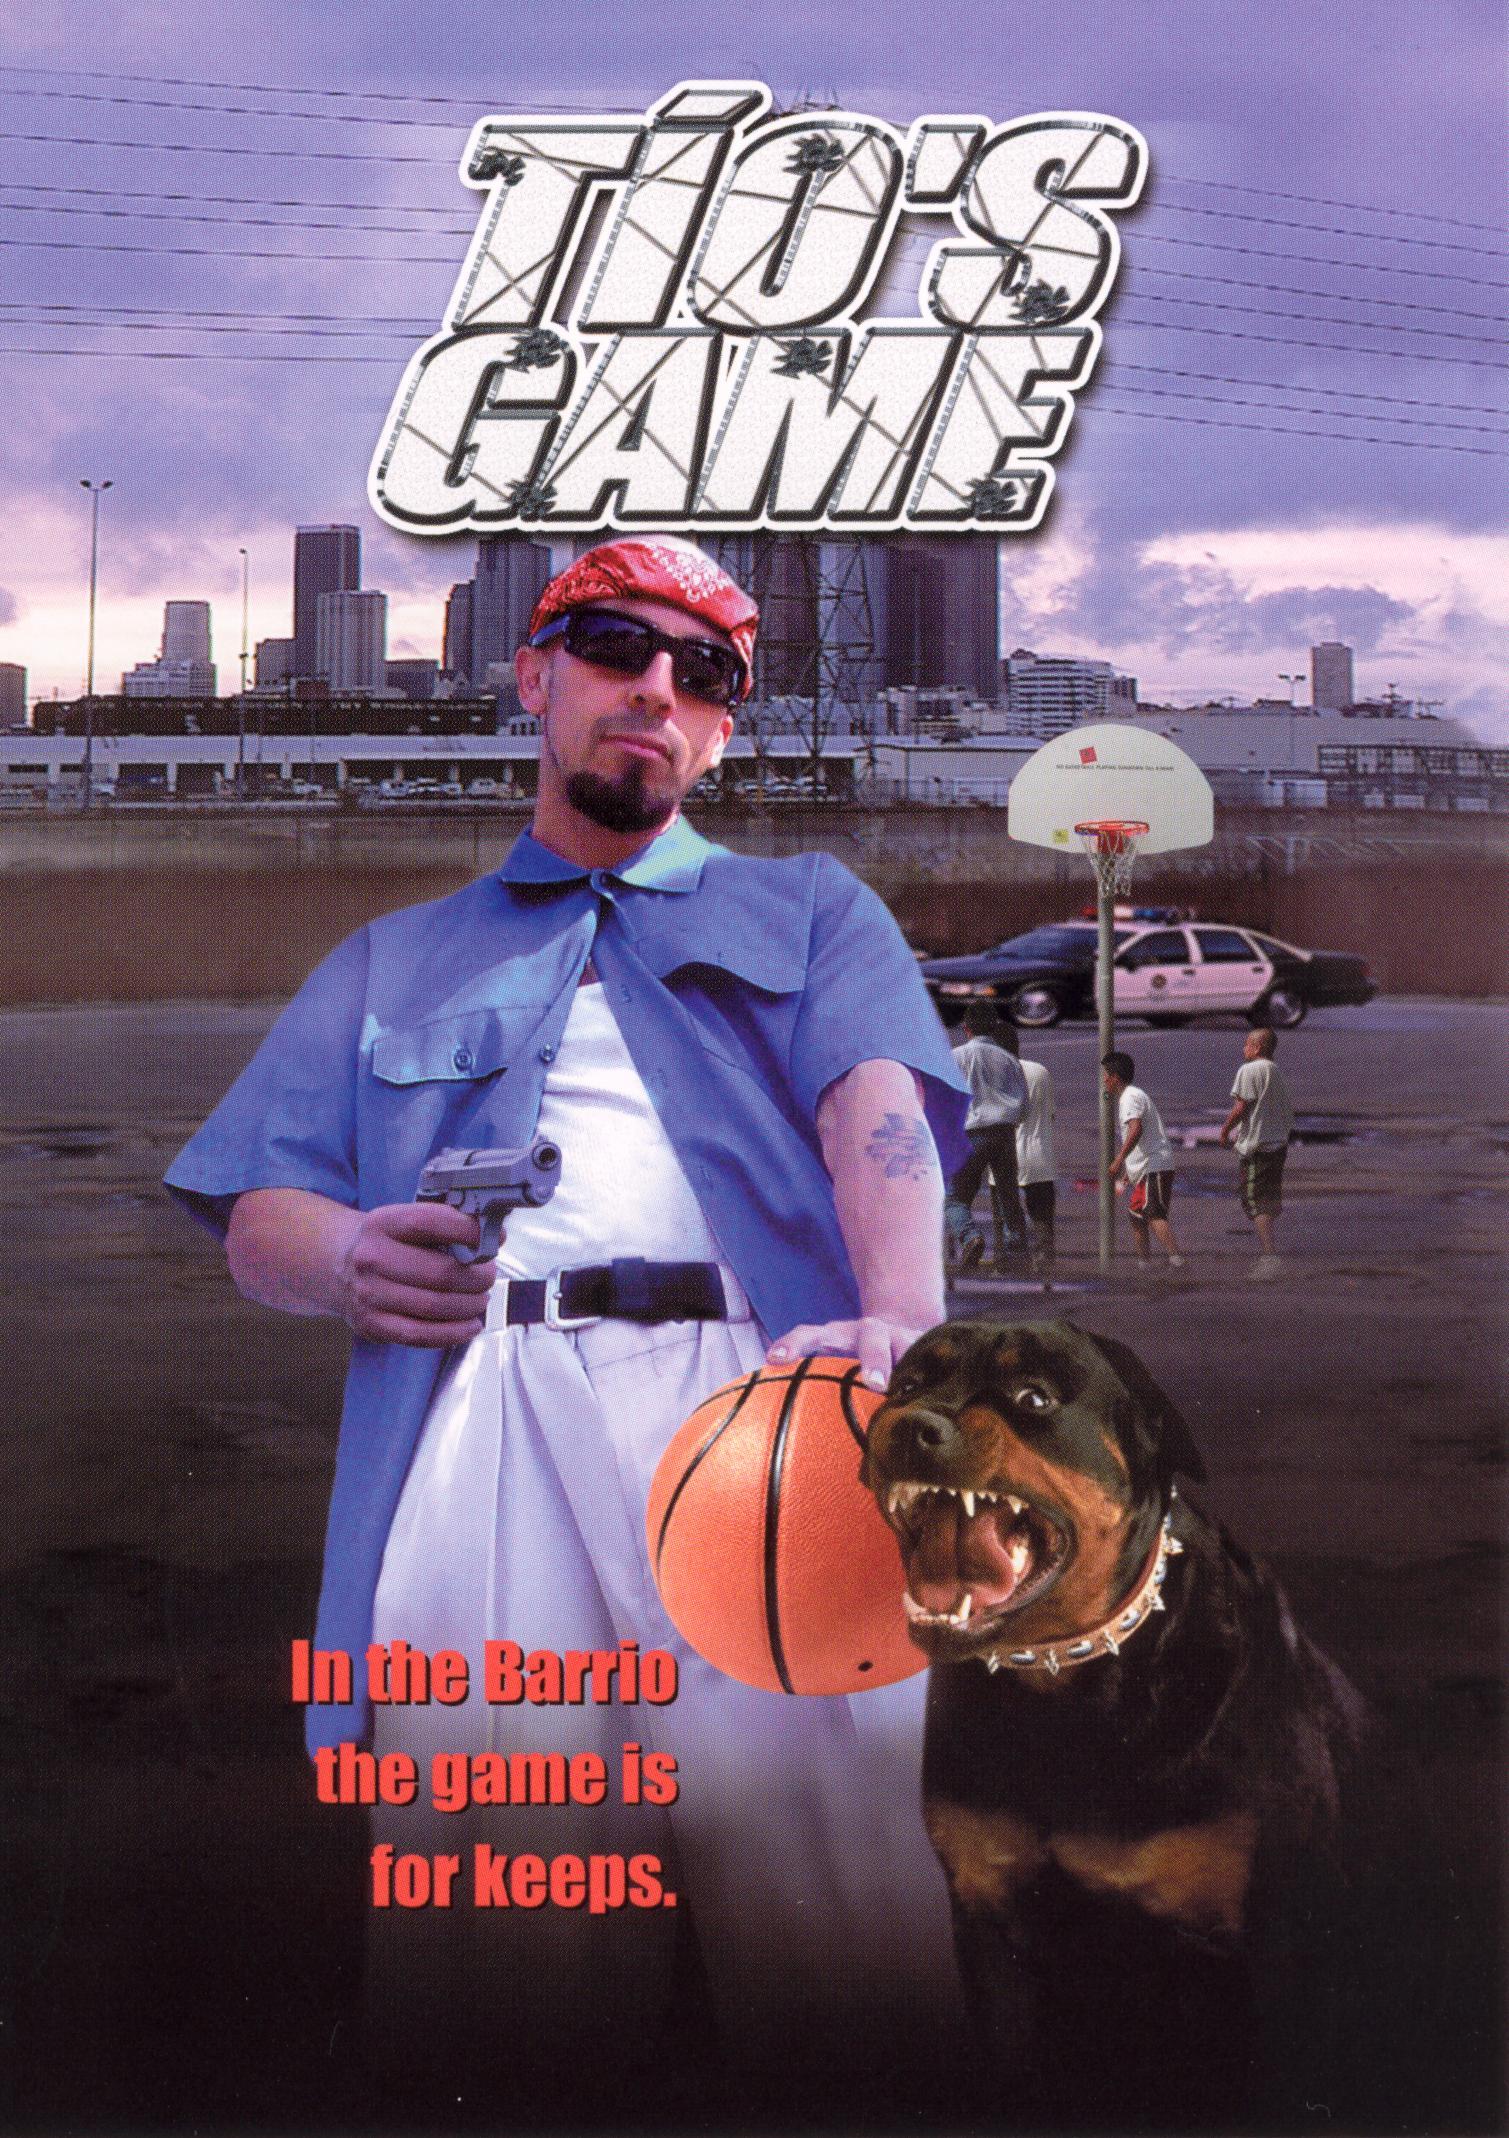 Tio's Game